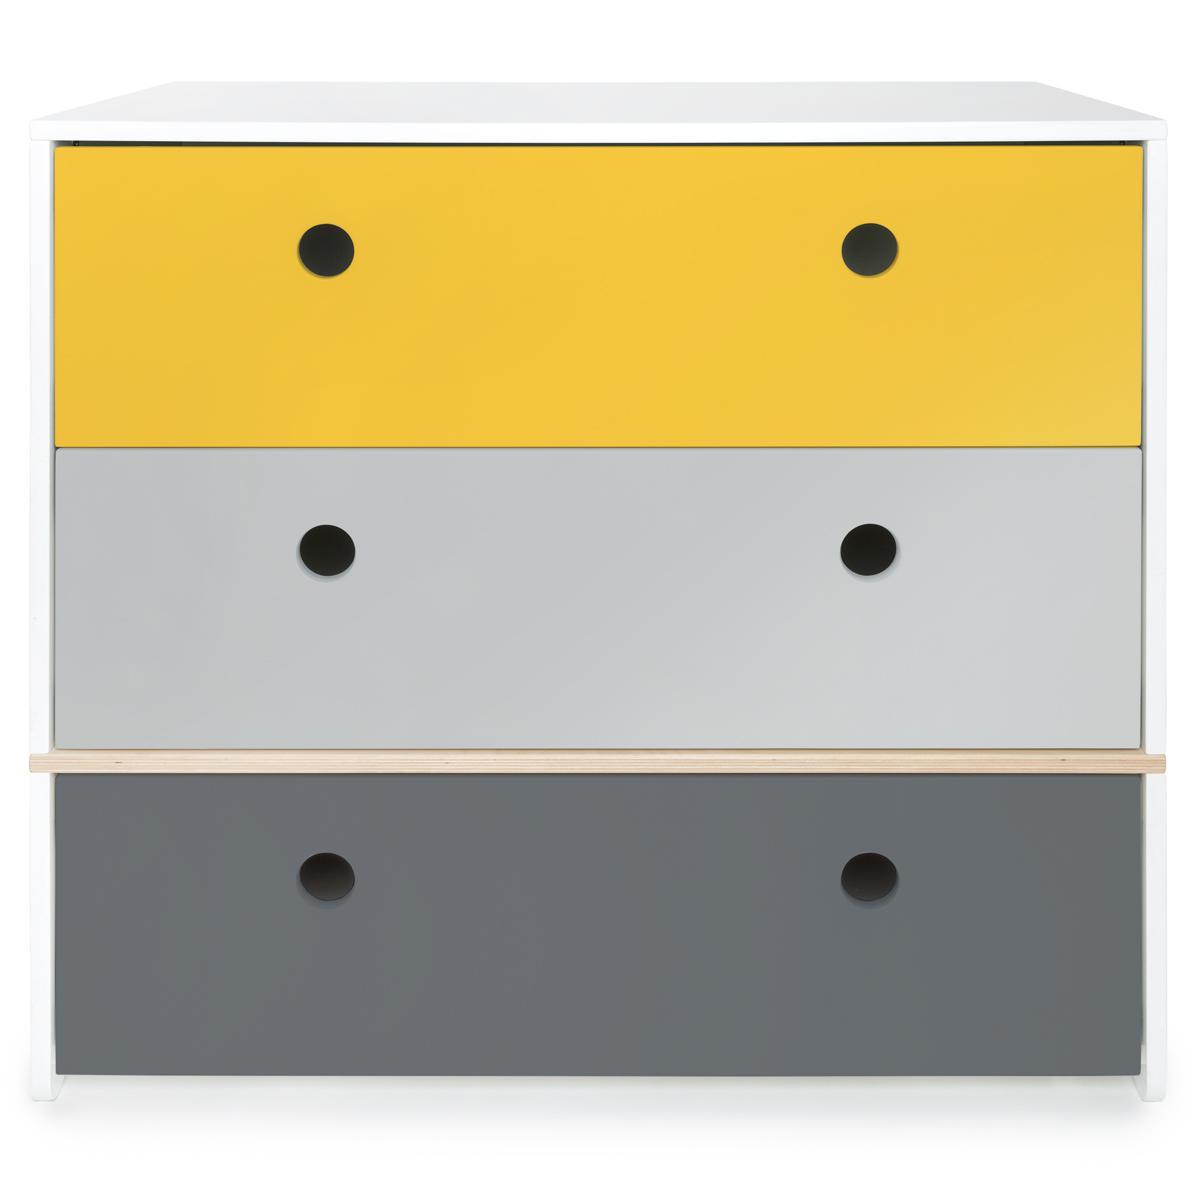 Commode COLORFLEX façades tiroirs nectar yellow-pearl grey-space grey